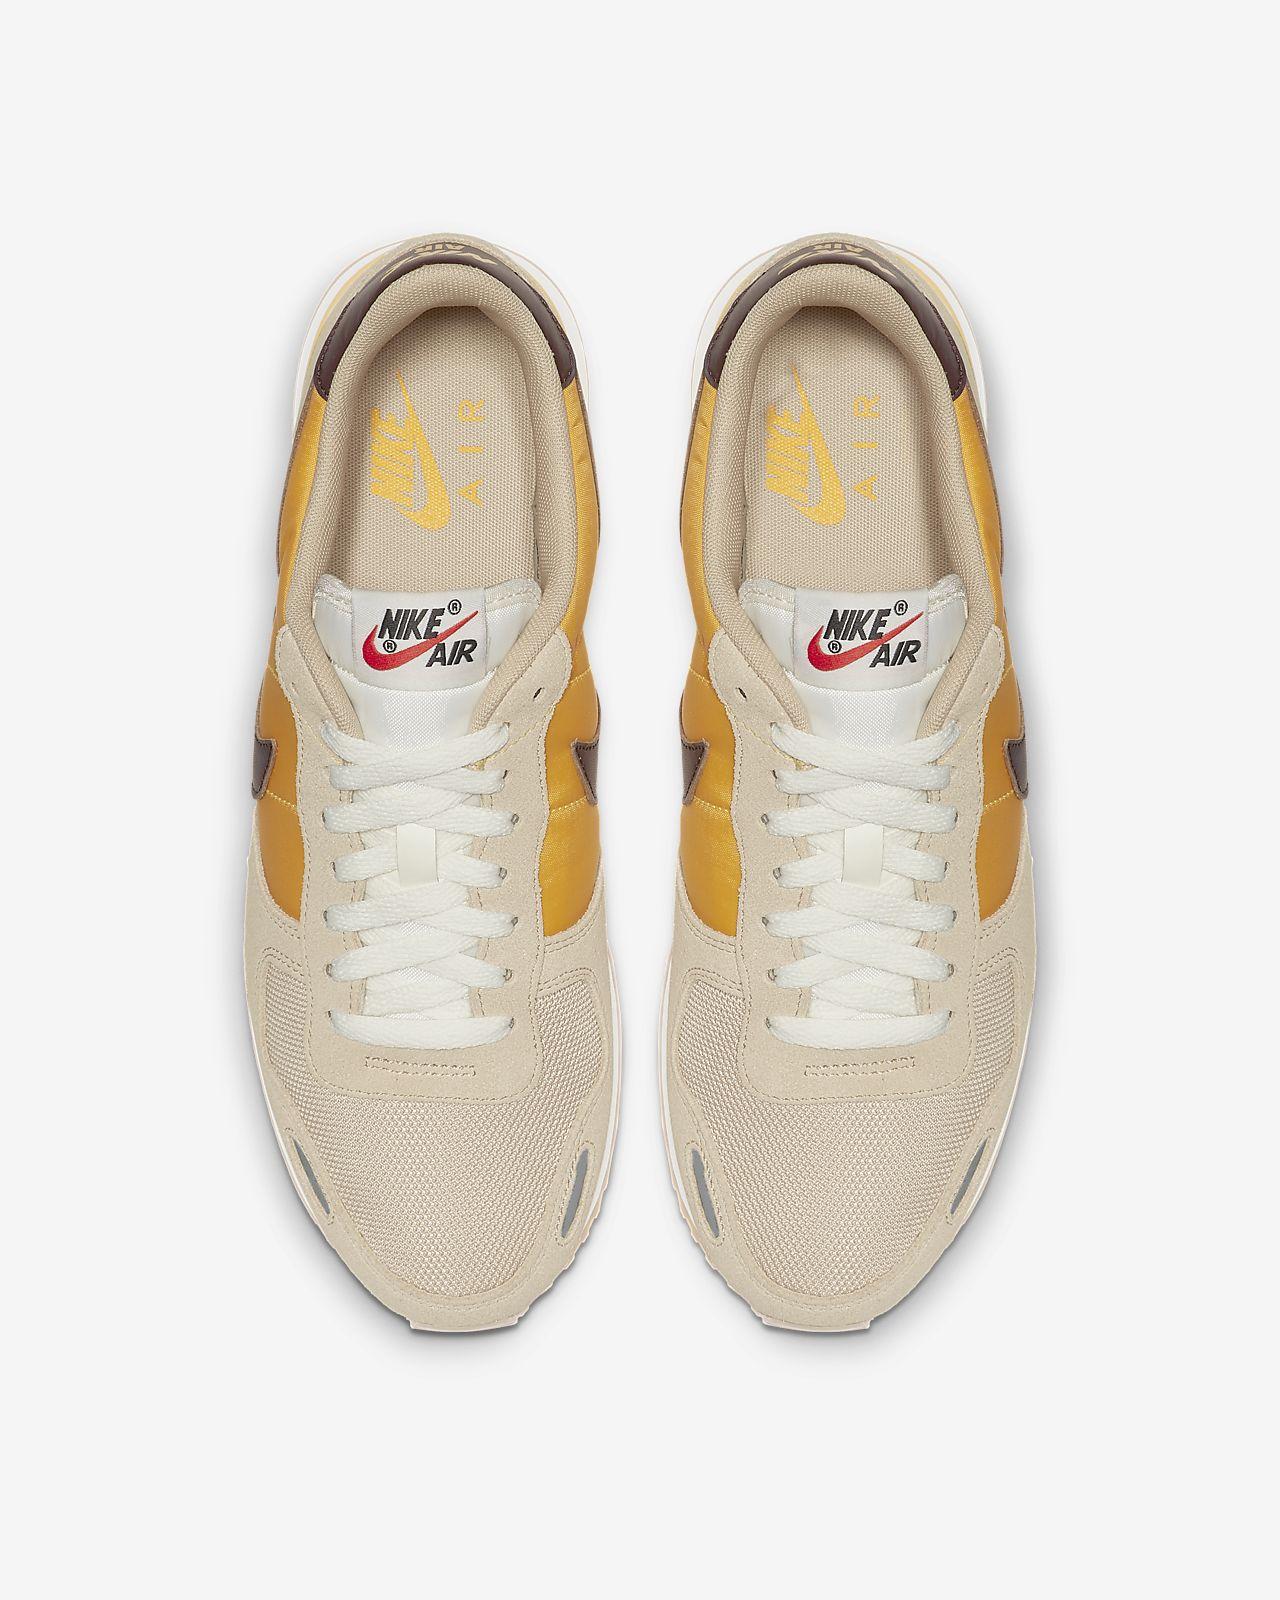 d2022ceb5ec608 Low Resolution Nike Air Vortex Herrenschuh Nike Air Vortex Herrenschuh